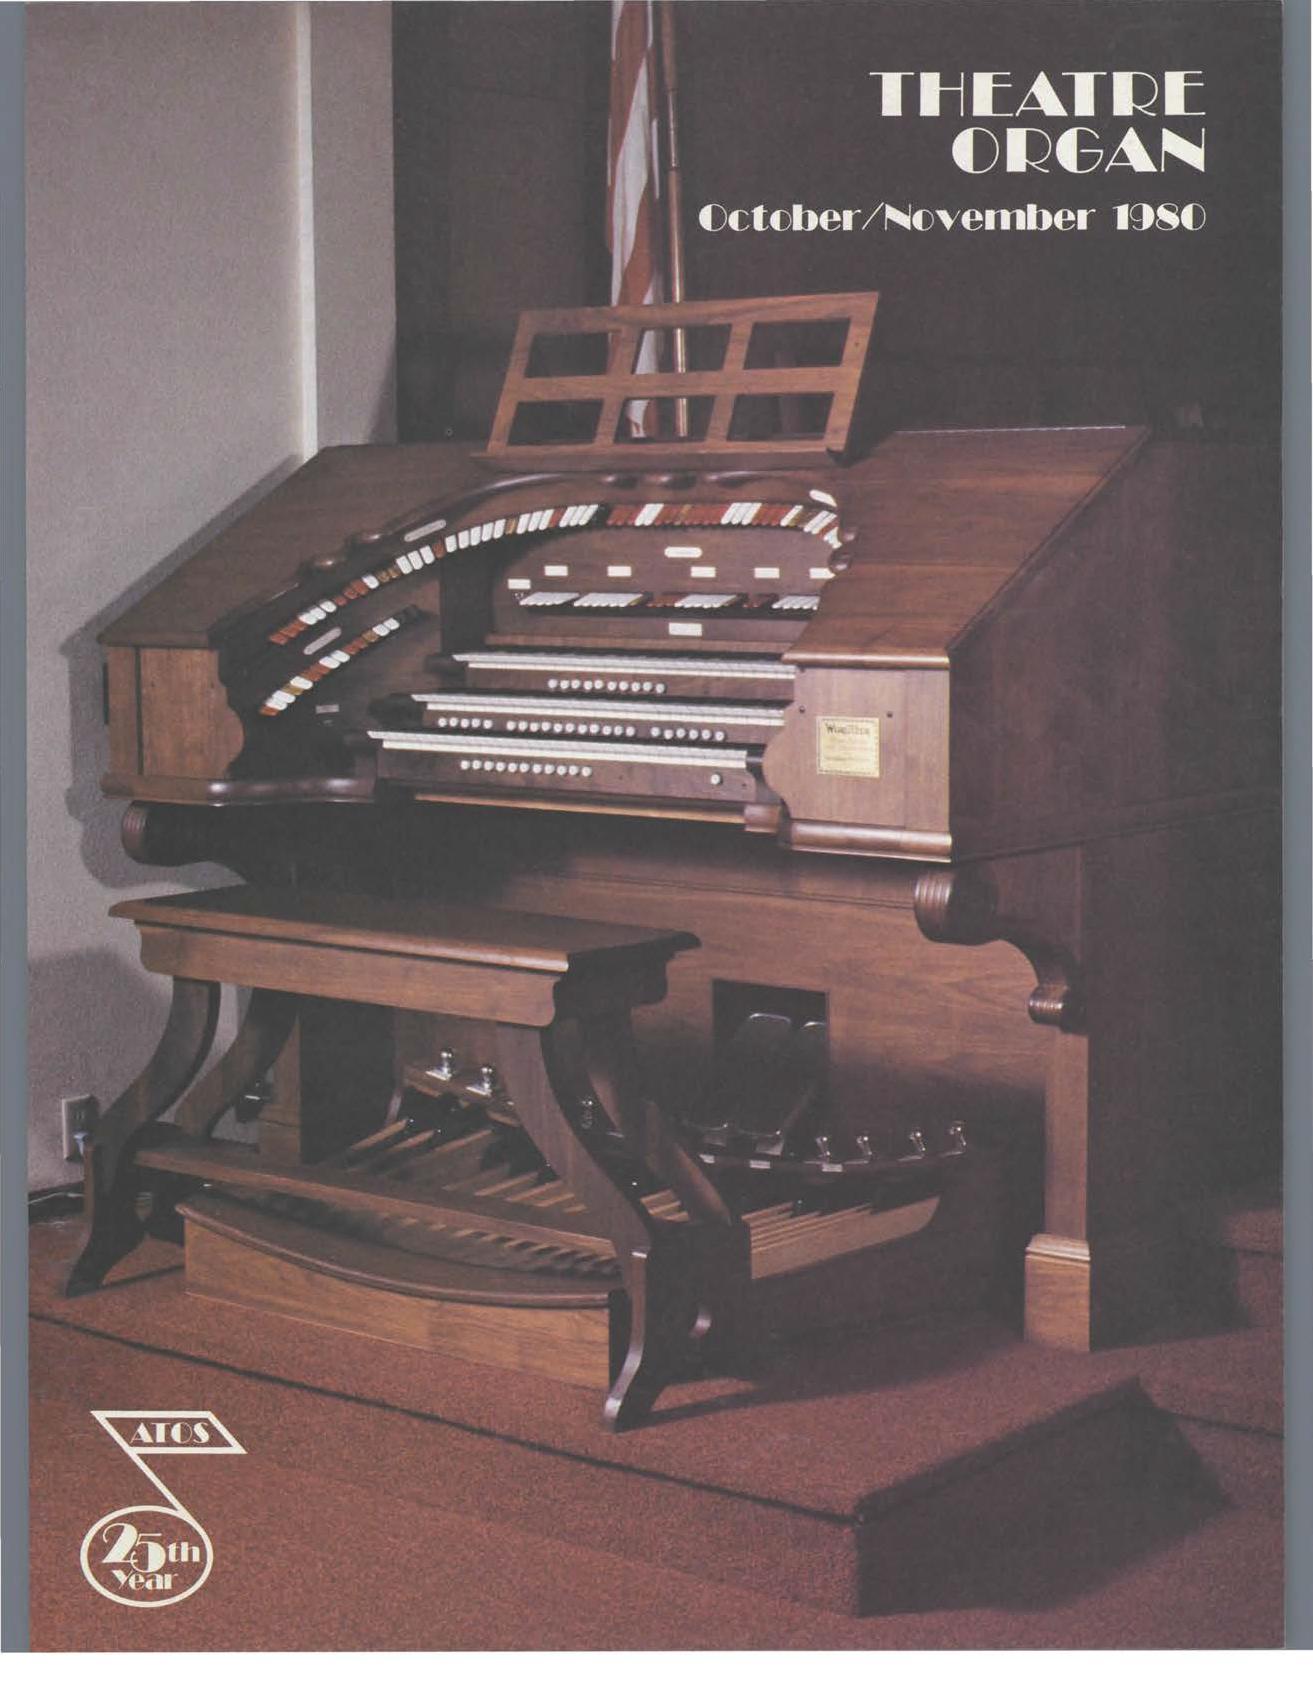 Theatre Organ, October - November 1980, Volume 22, Number 5